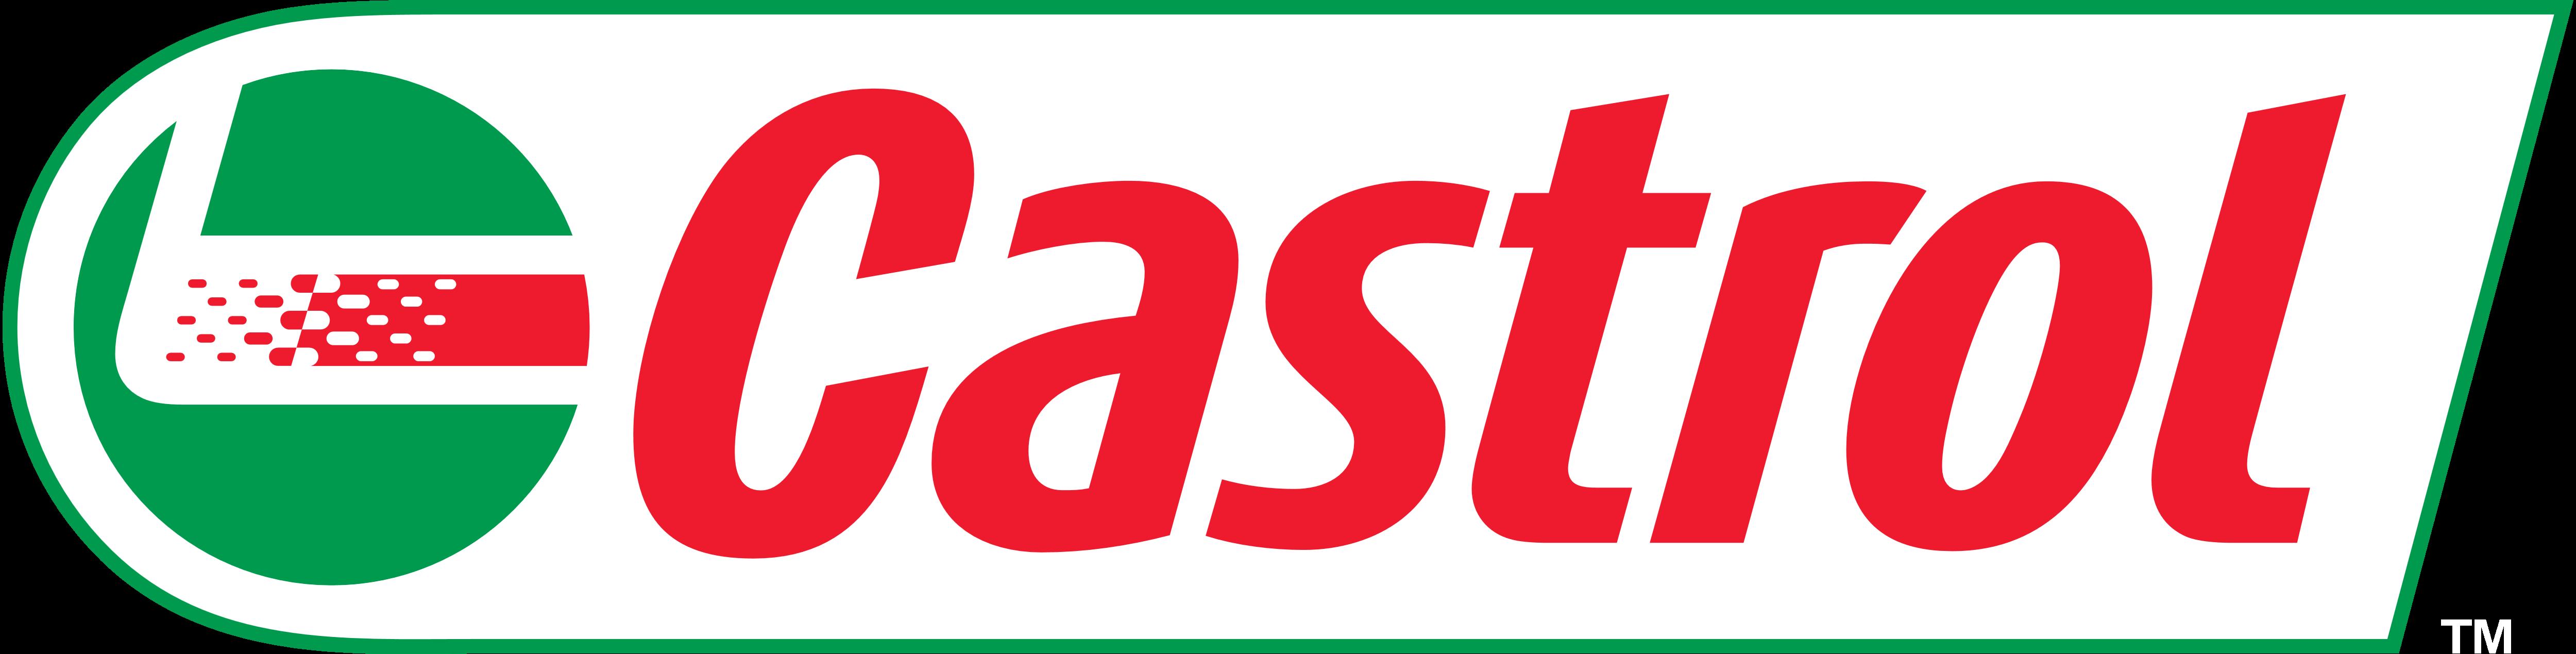 Castrol.